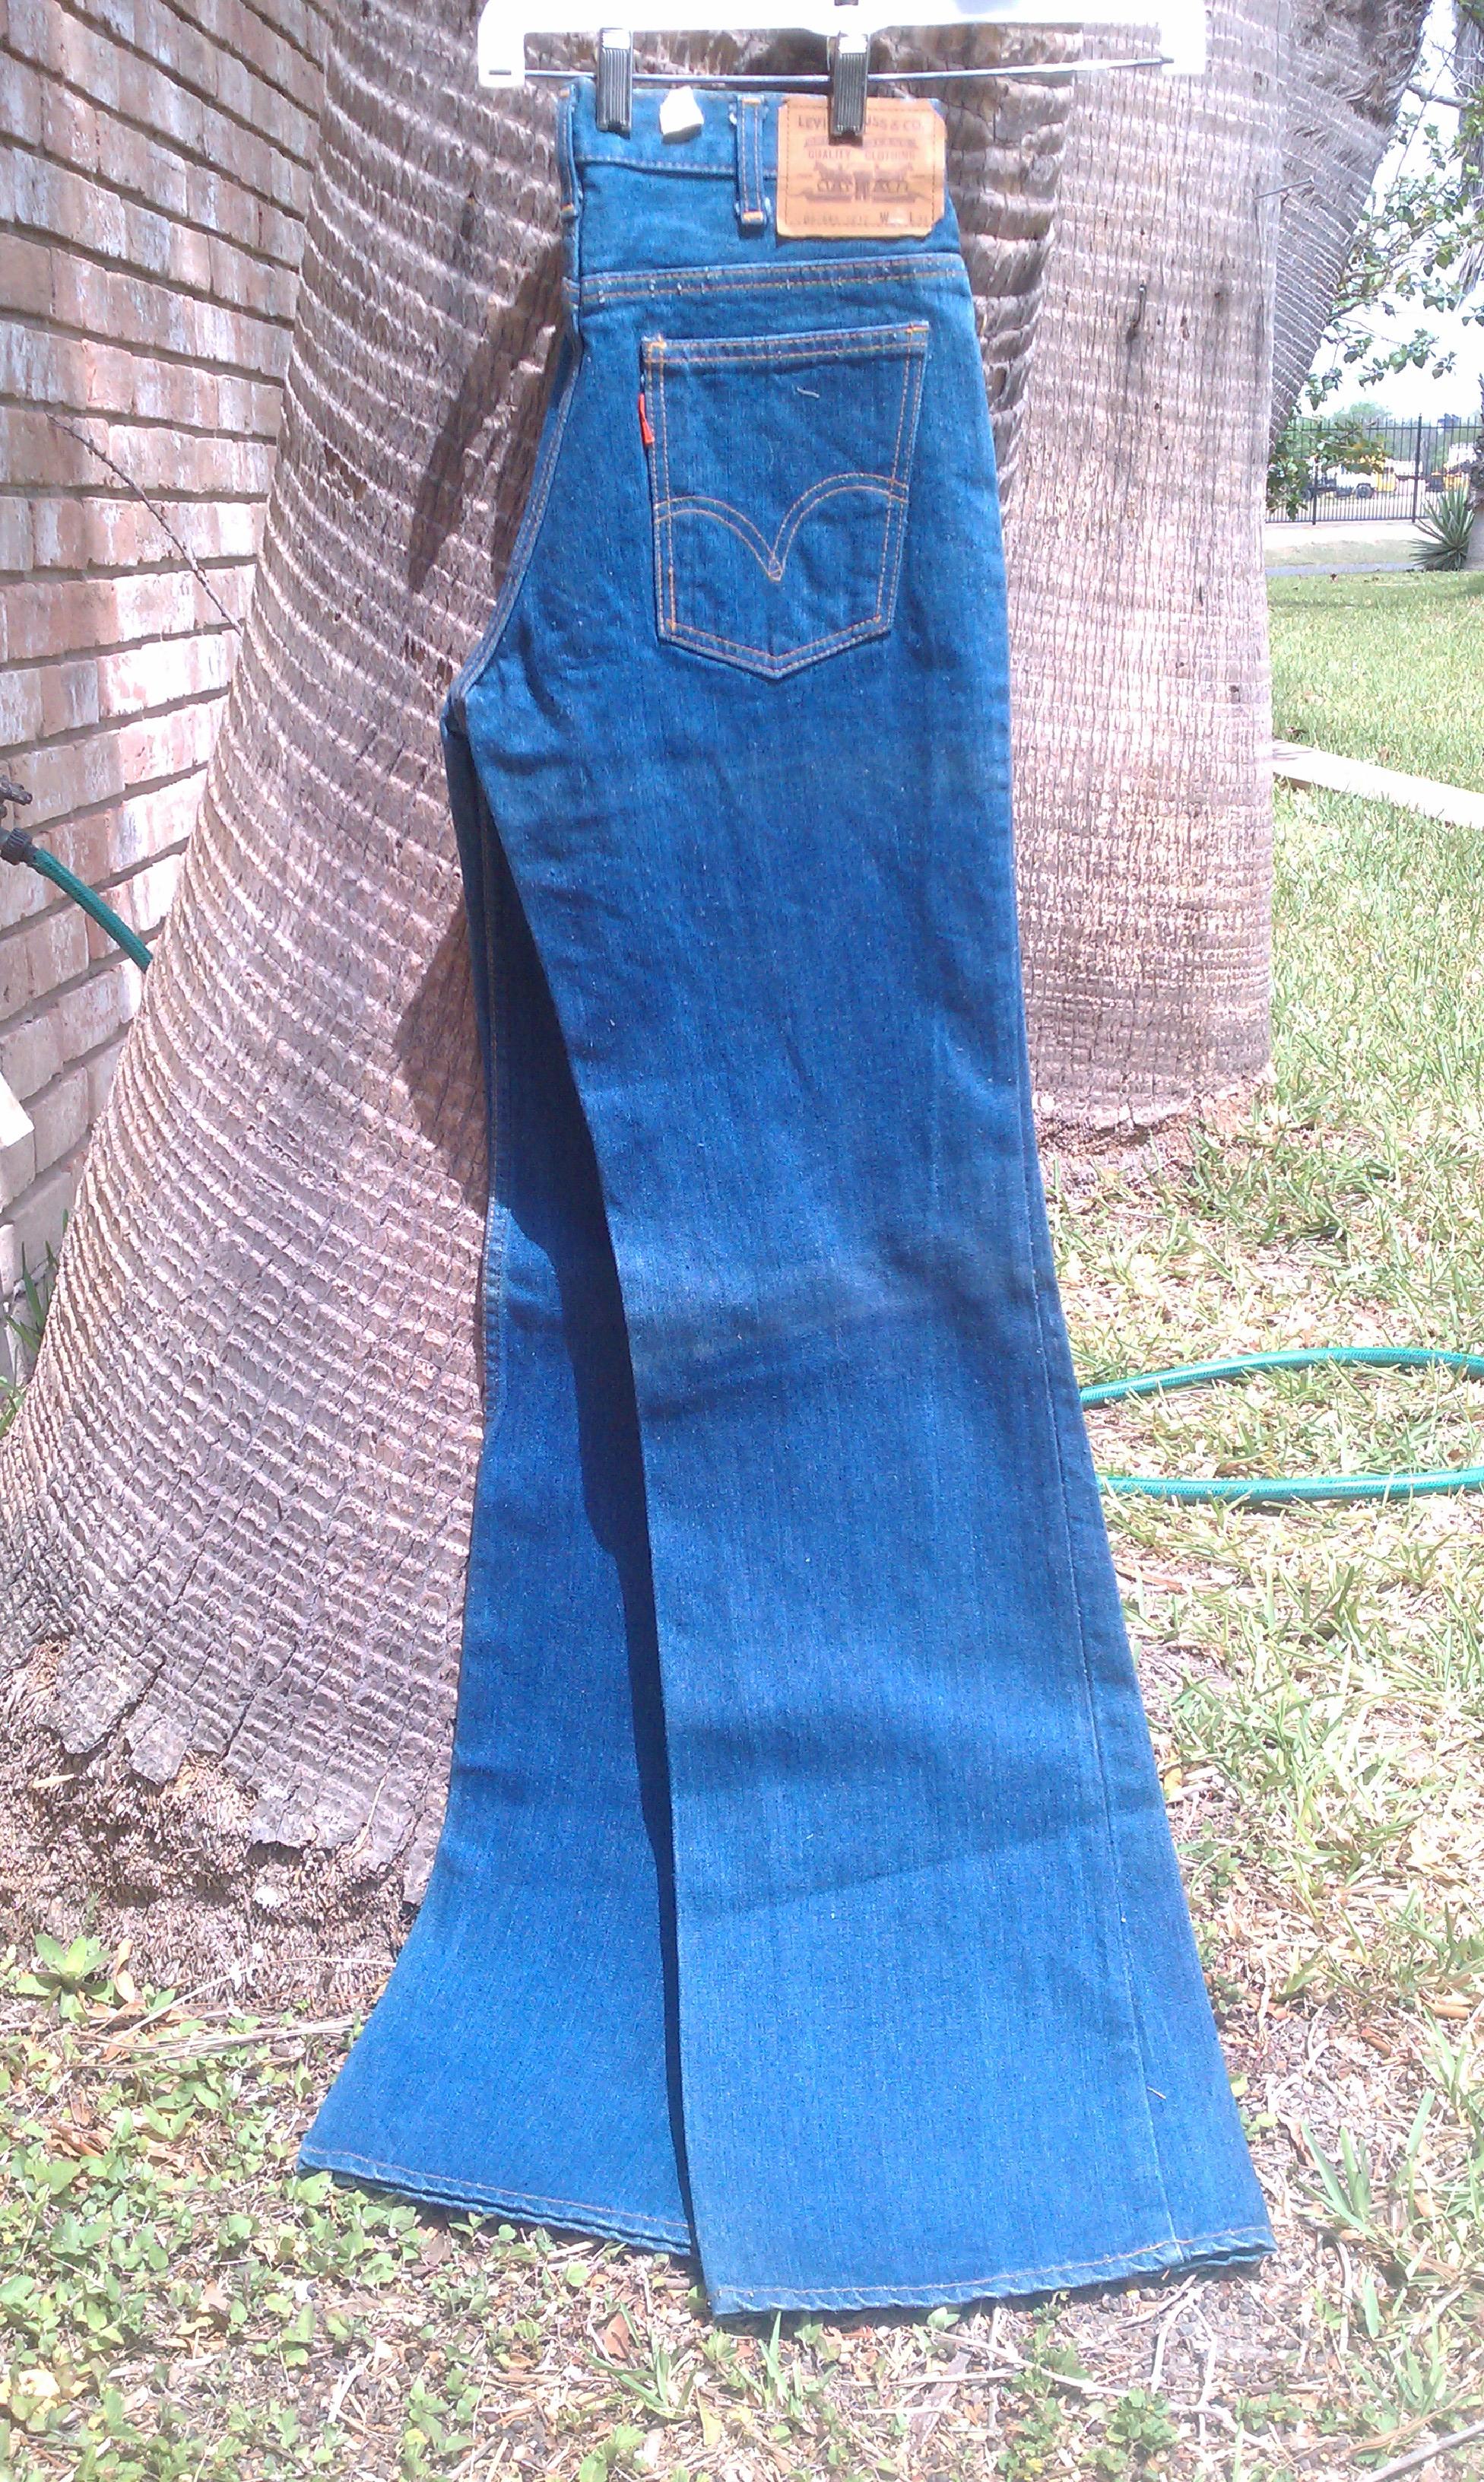 Levis 212 Heavy 14 Oz Denim 70s Vintage Big Bell Bottom Jeans